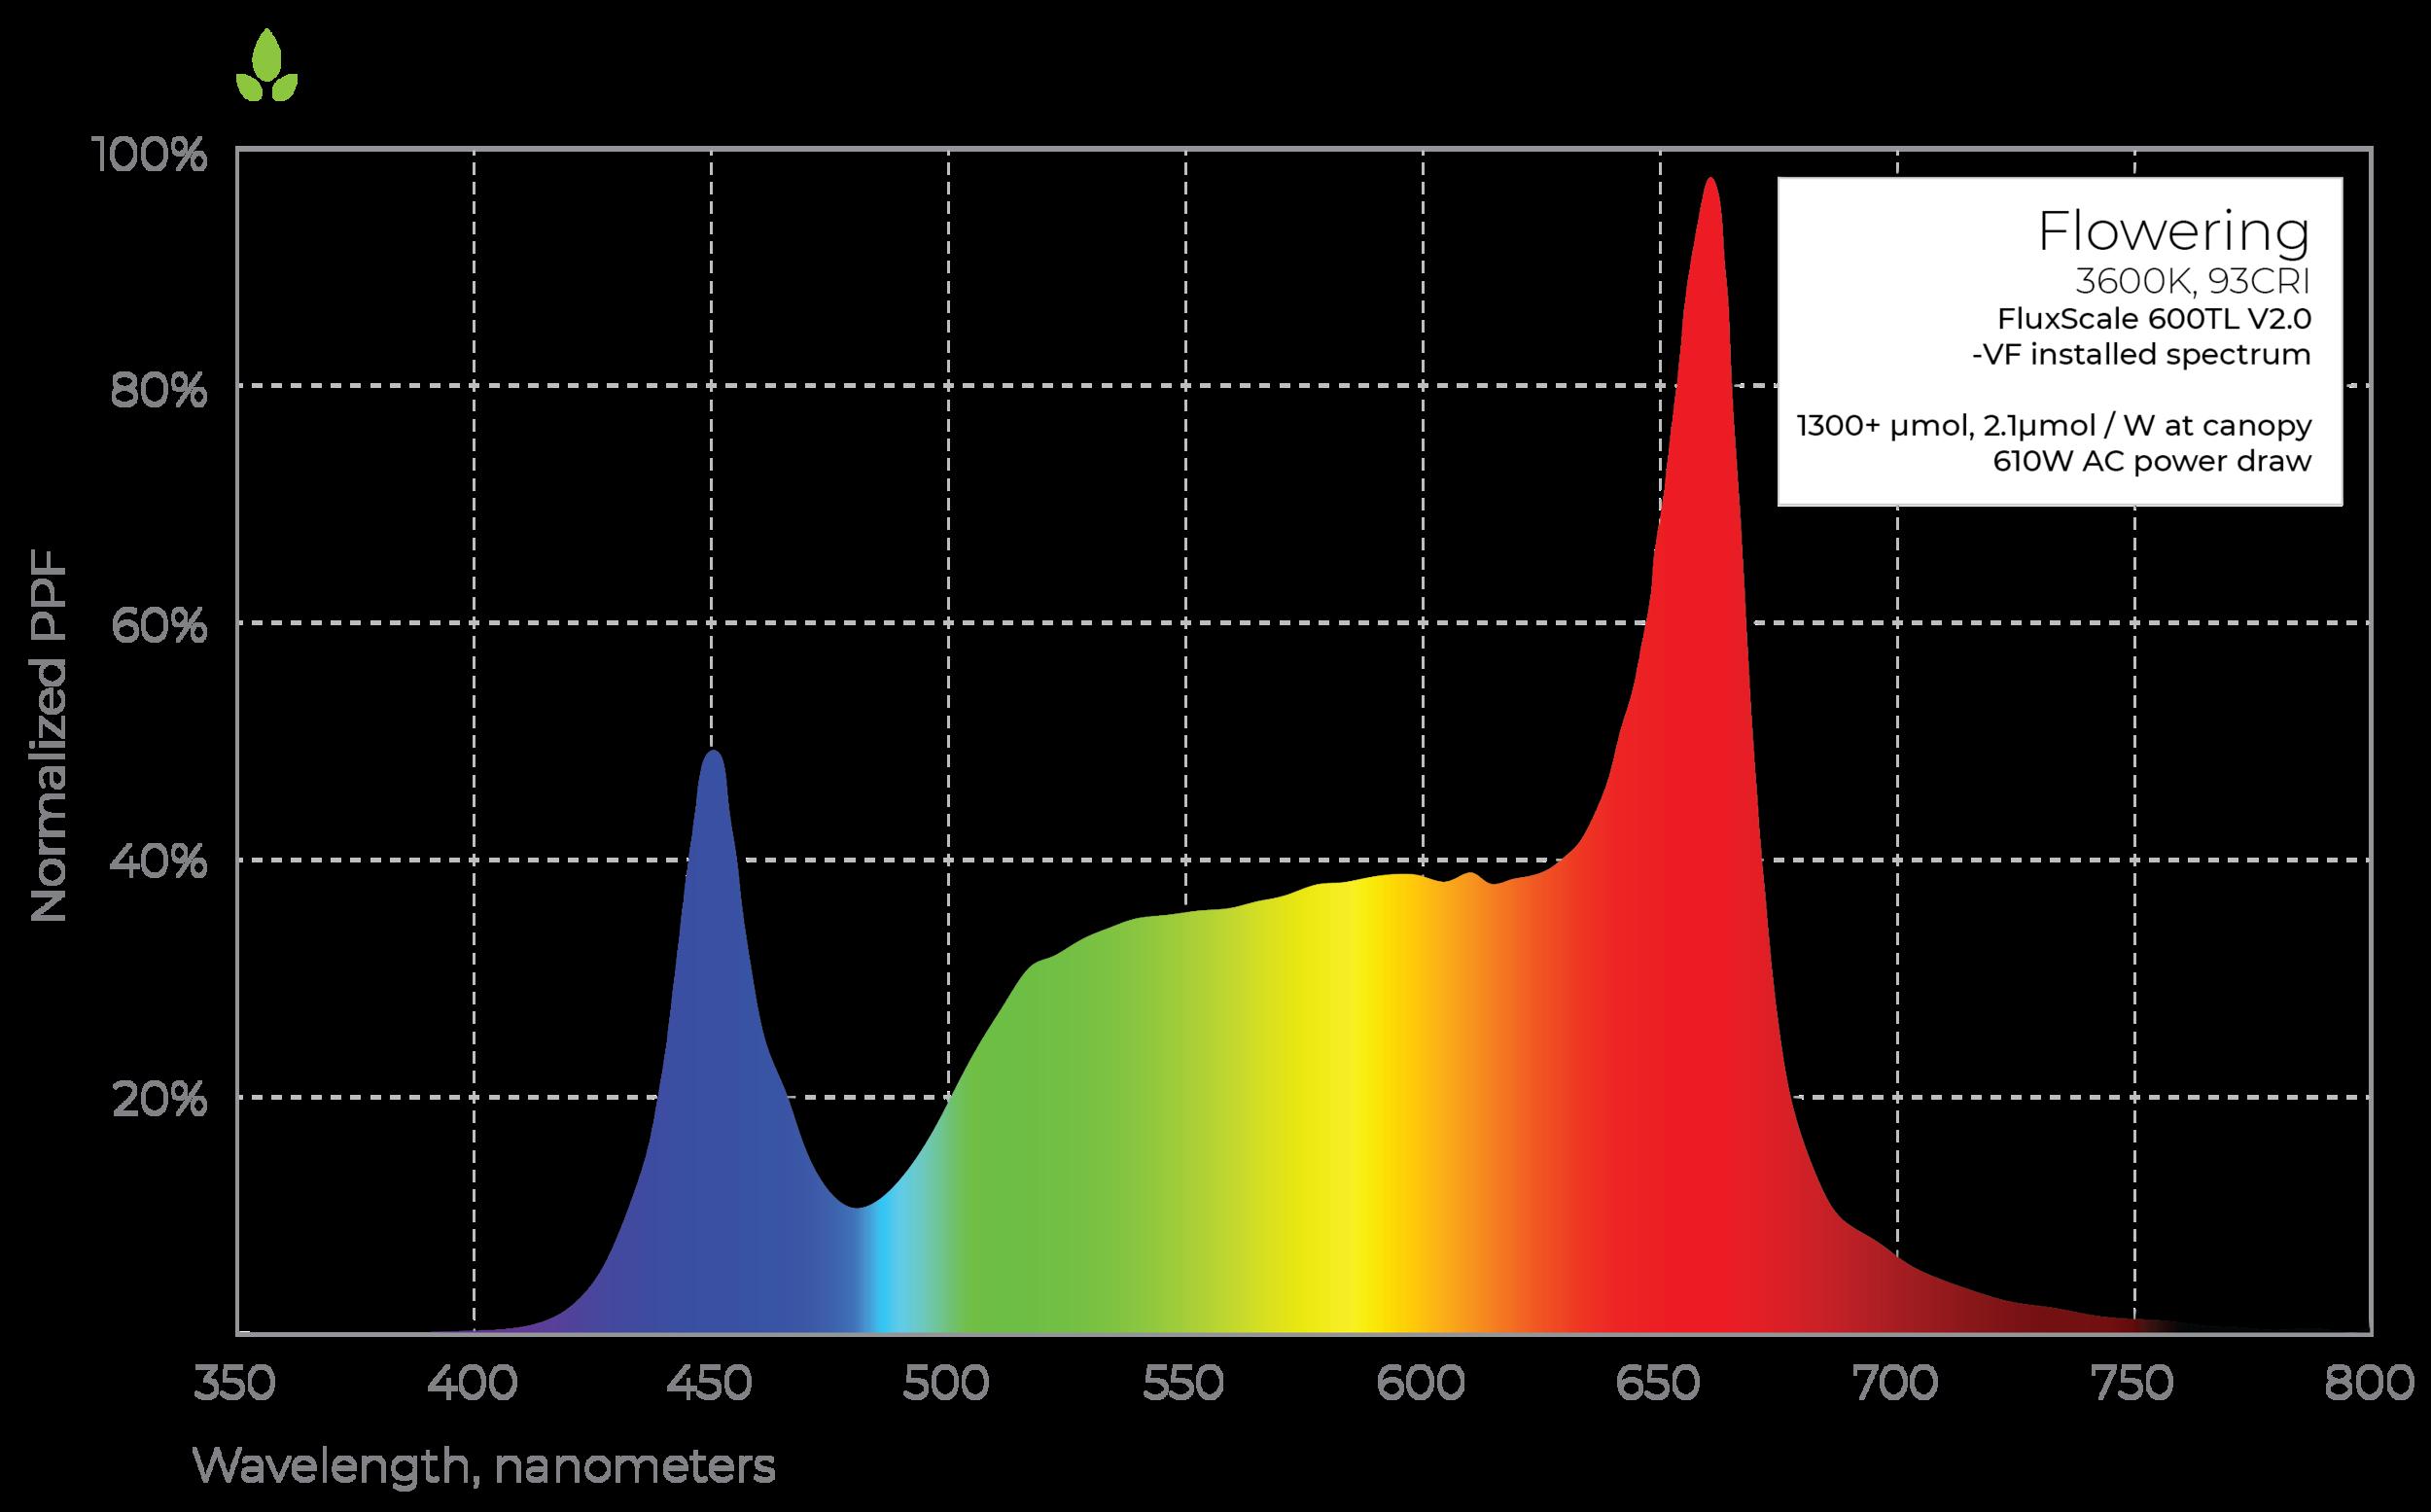 FluxScale 600TL LED grow light flowering spectrum